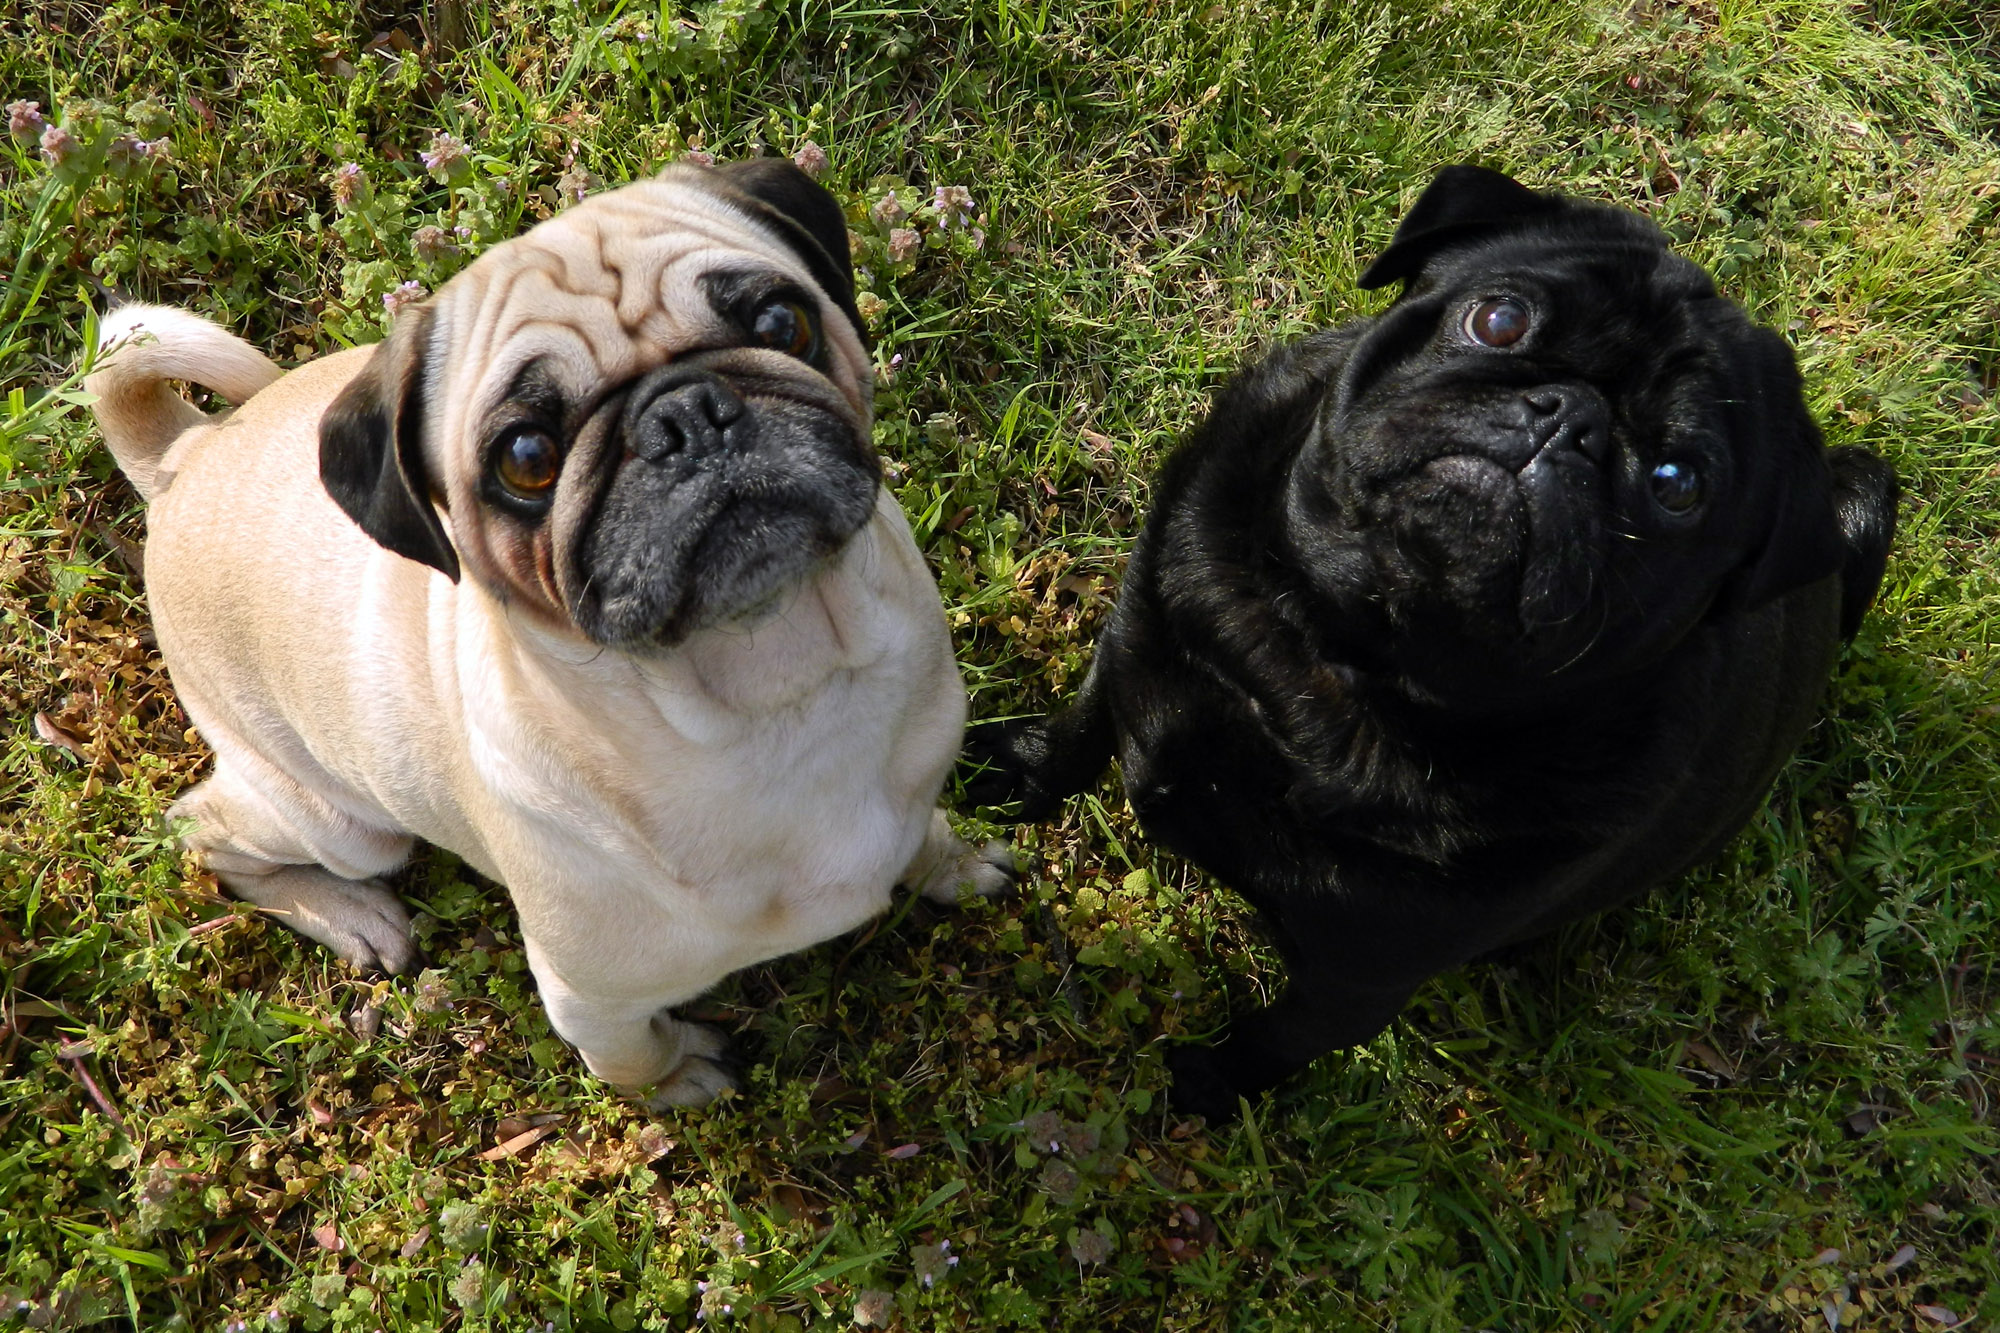 Double Be Black Dog Breeds Beginning At English Springer Spaniel St Dog Breeds Around World Entertainmentaroundworld Dog Breeds That Start bark post Dog Breeds That Start With B